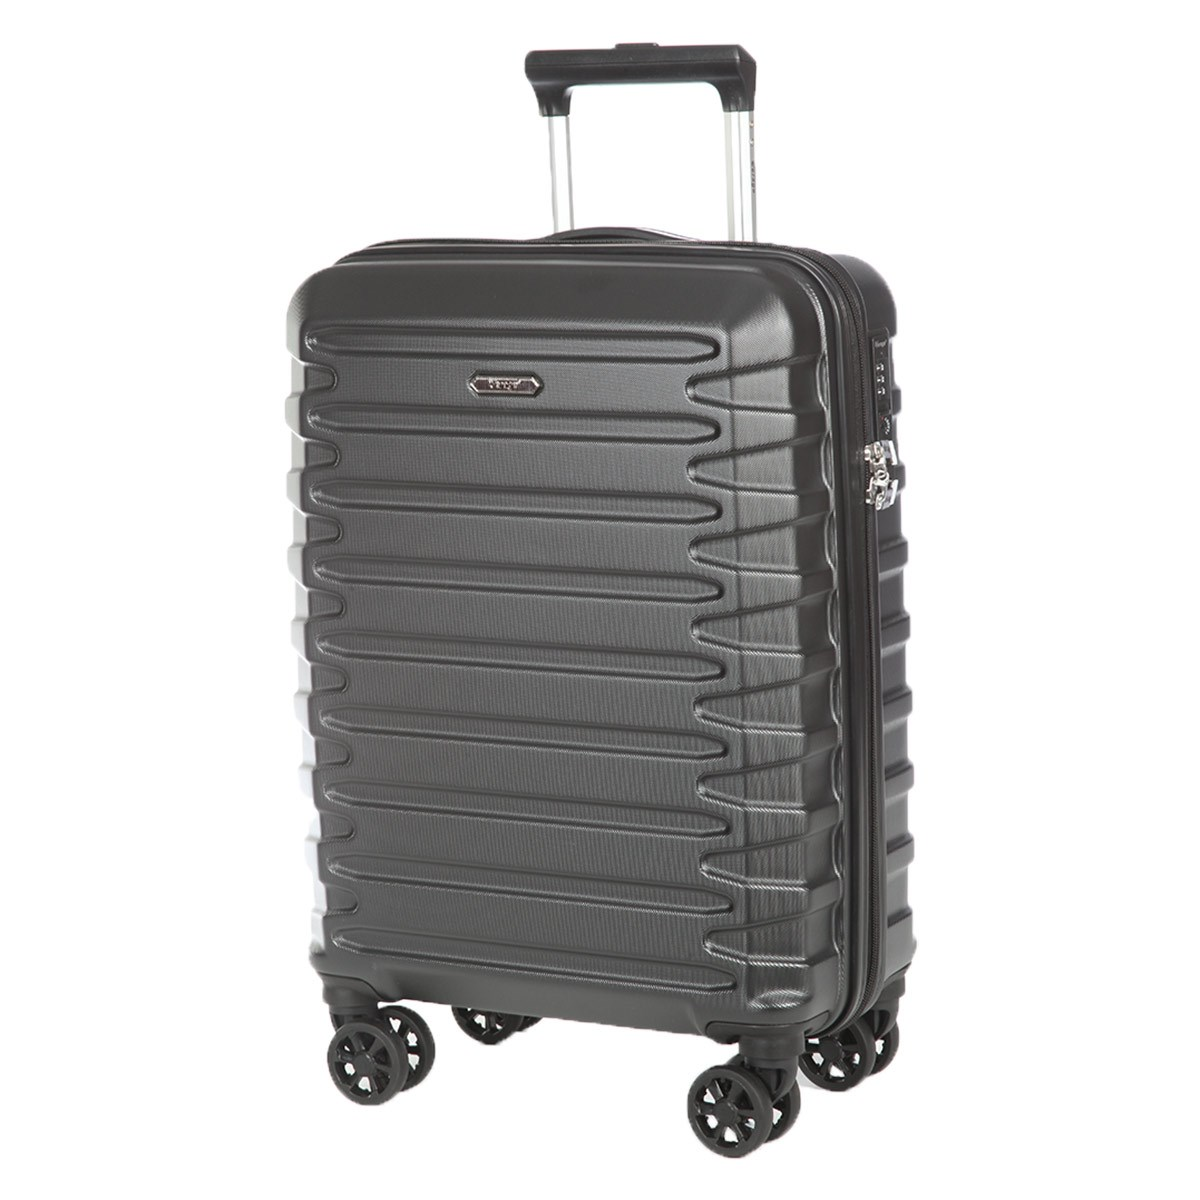 Suitcase-trolley Verage GM17106W19 black